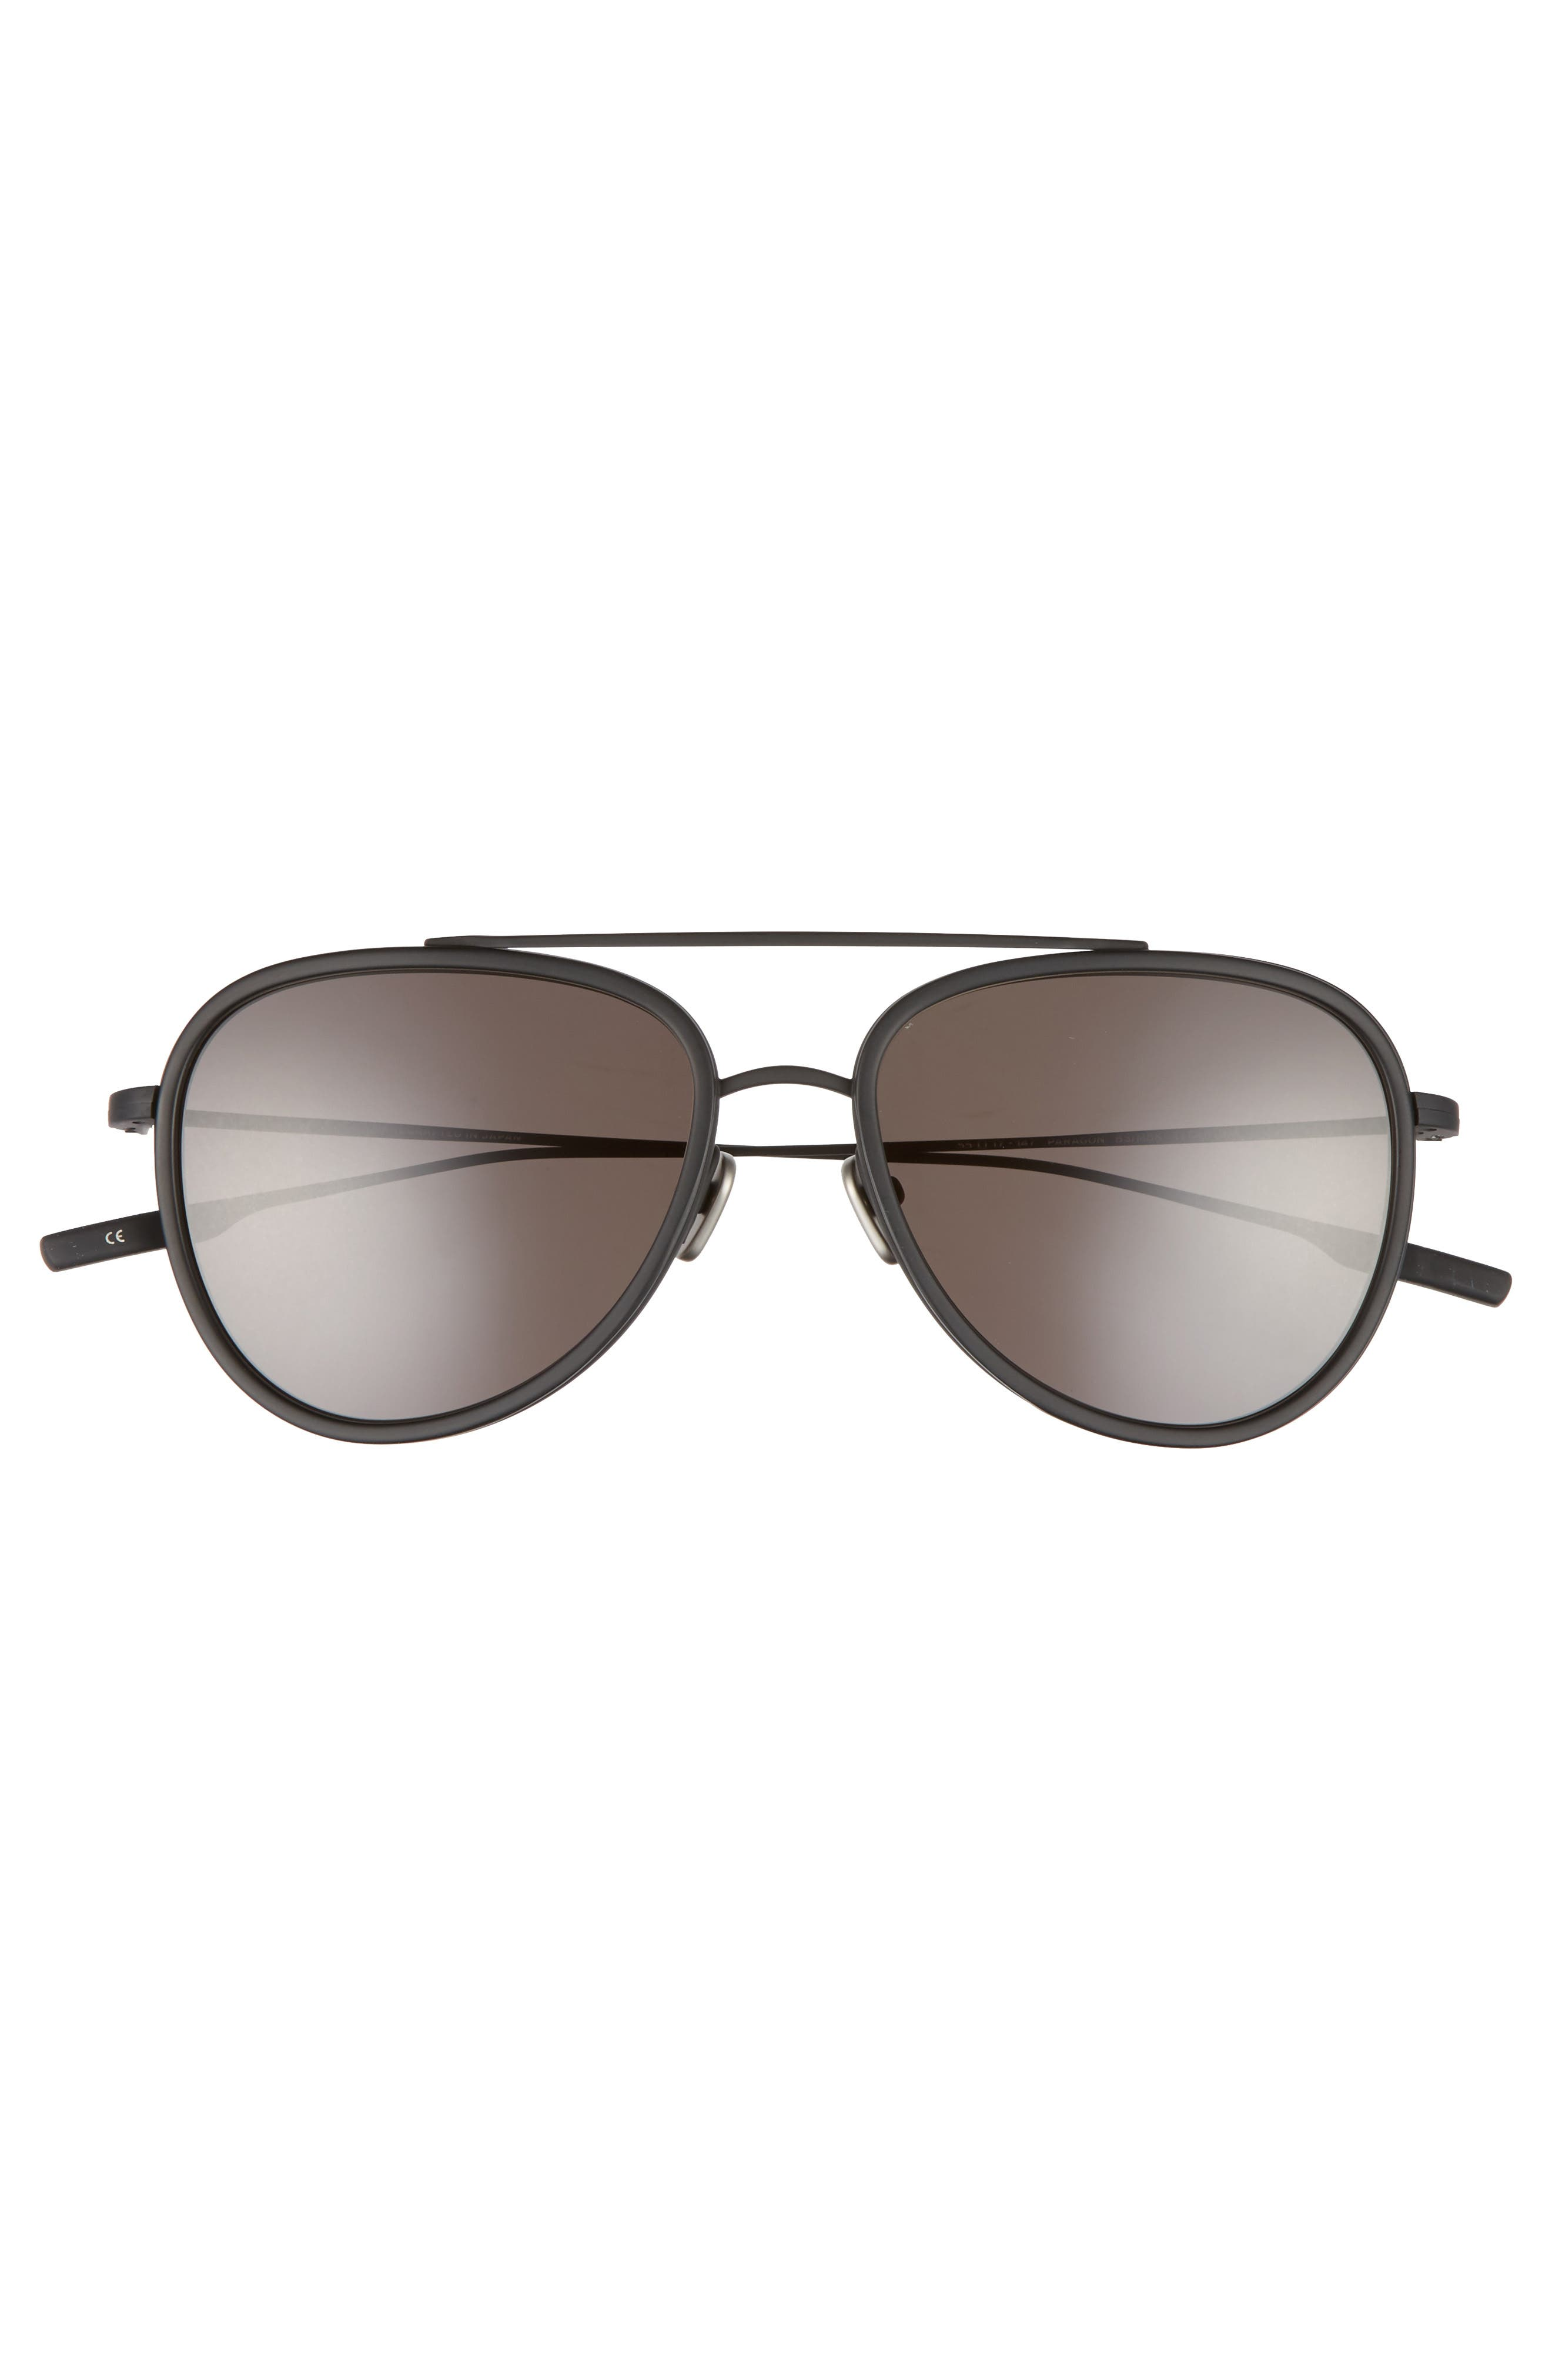 Paragon 55mm Polarized Aviator Sunglasses,                             Alternate thumbnail 2, color,                             010